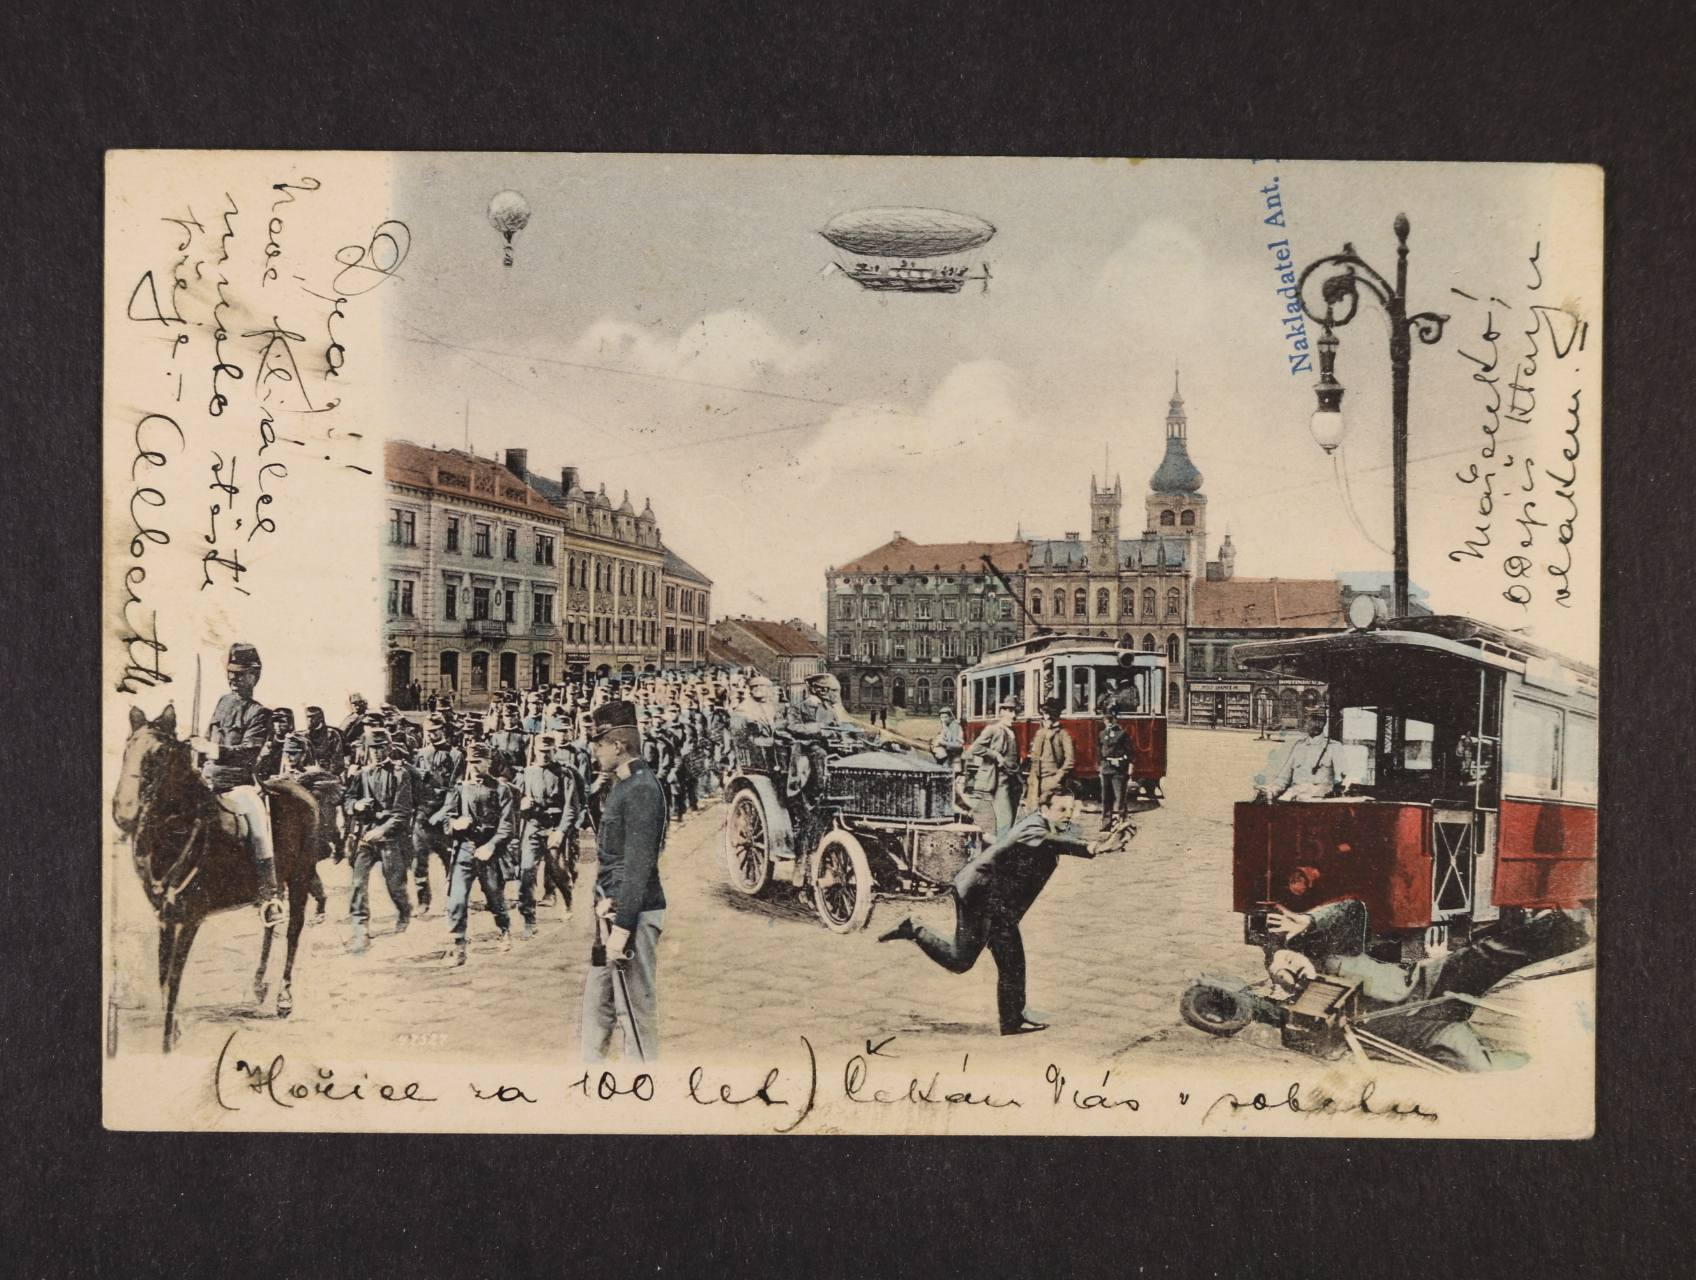 Hořice - bar. litograf. koláž, dl. adresa, použitá 1904, dobrá kvalita